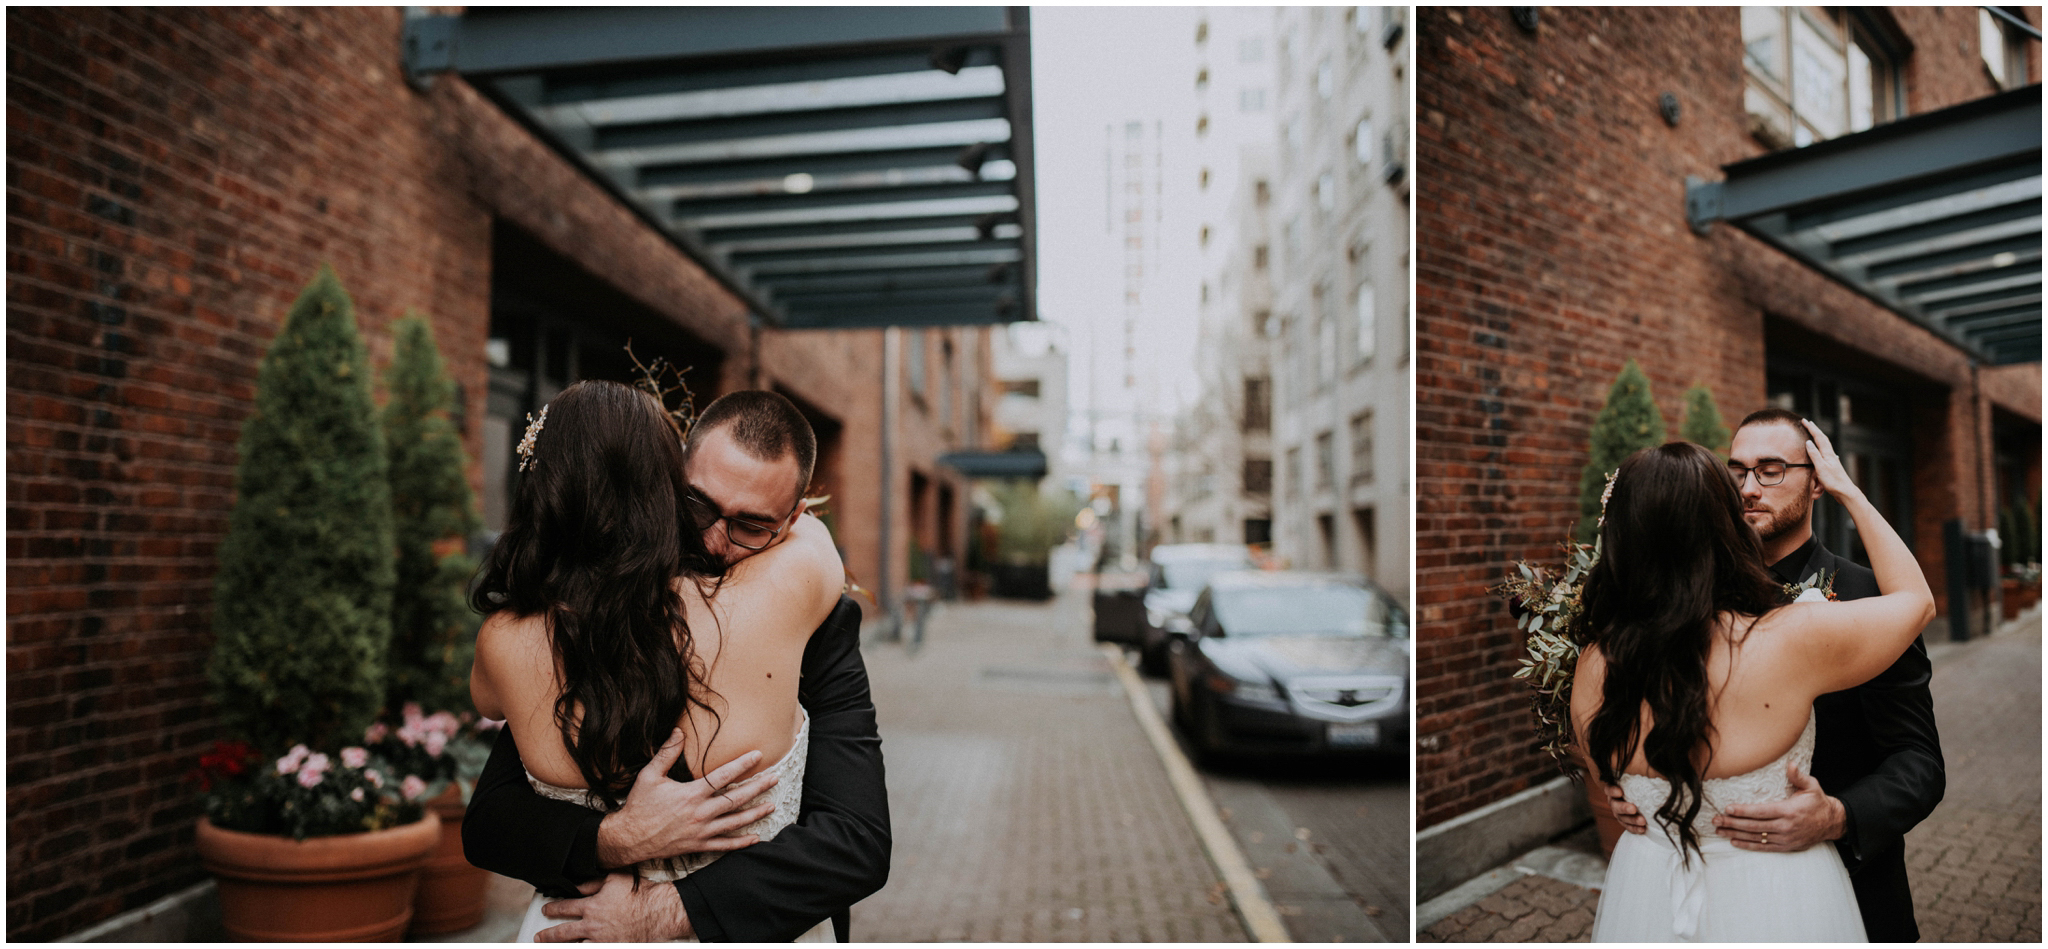 danny+mackenzie+downtown-seattle-axis-wedding-seattle-photographer-030.jpg